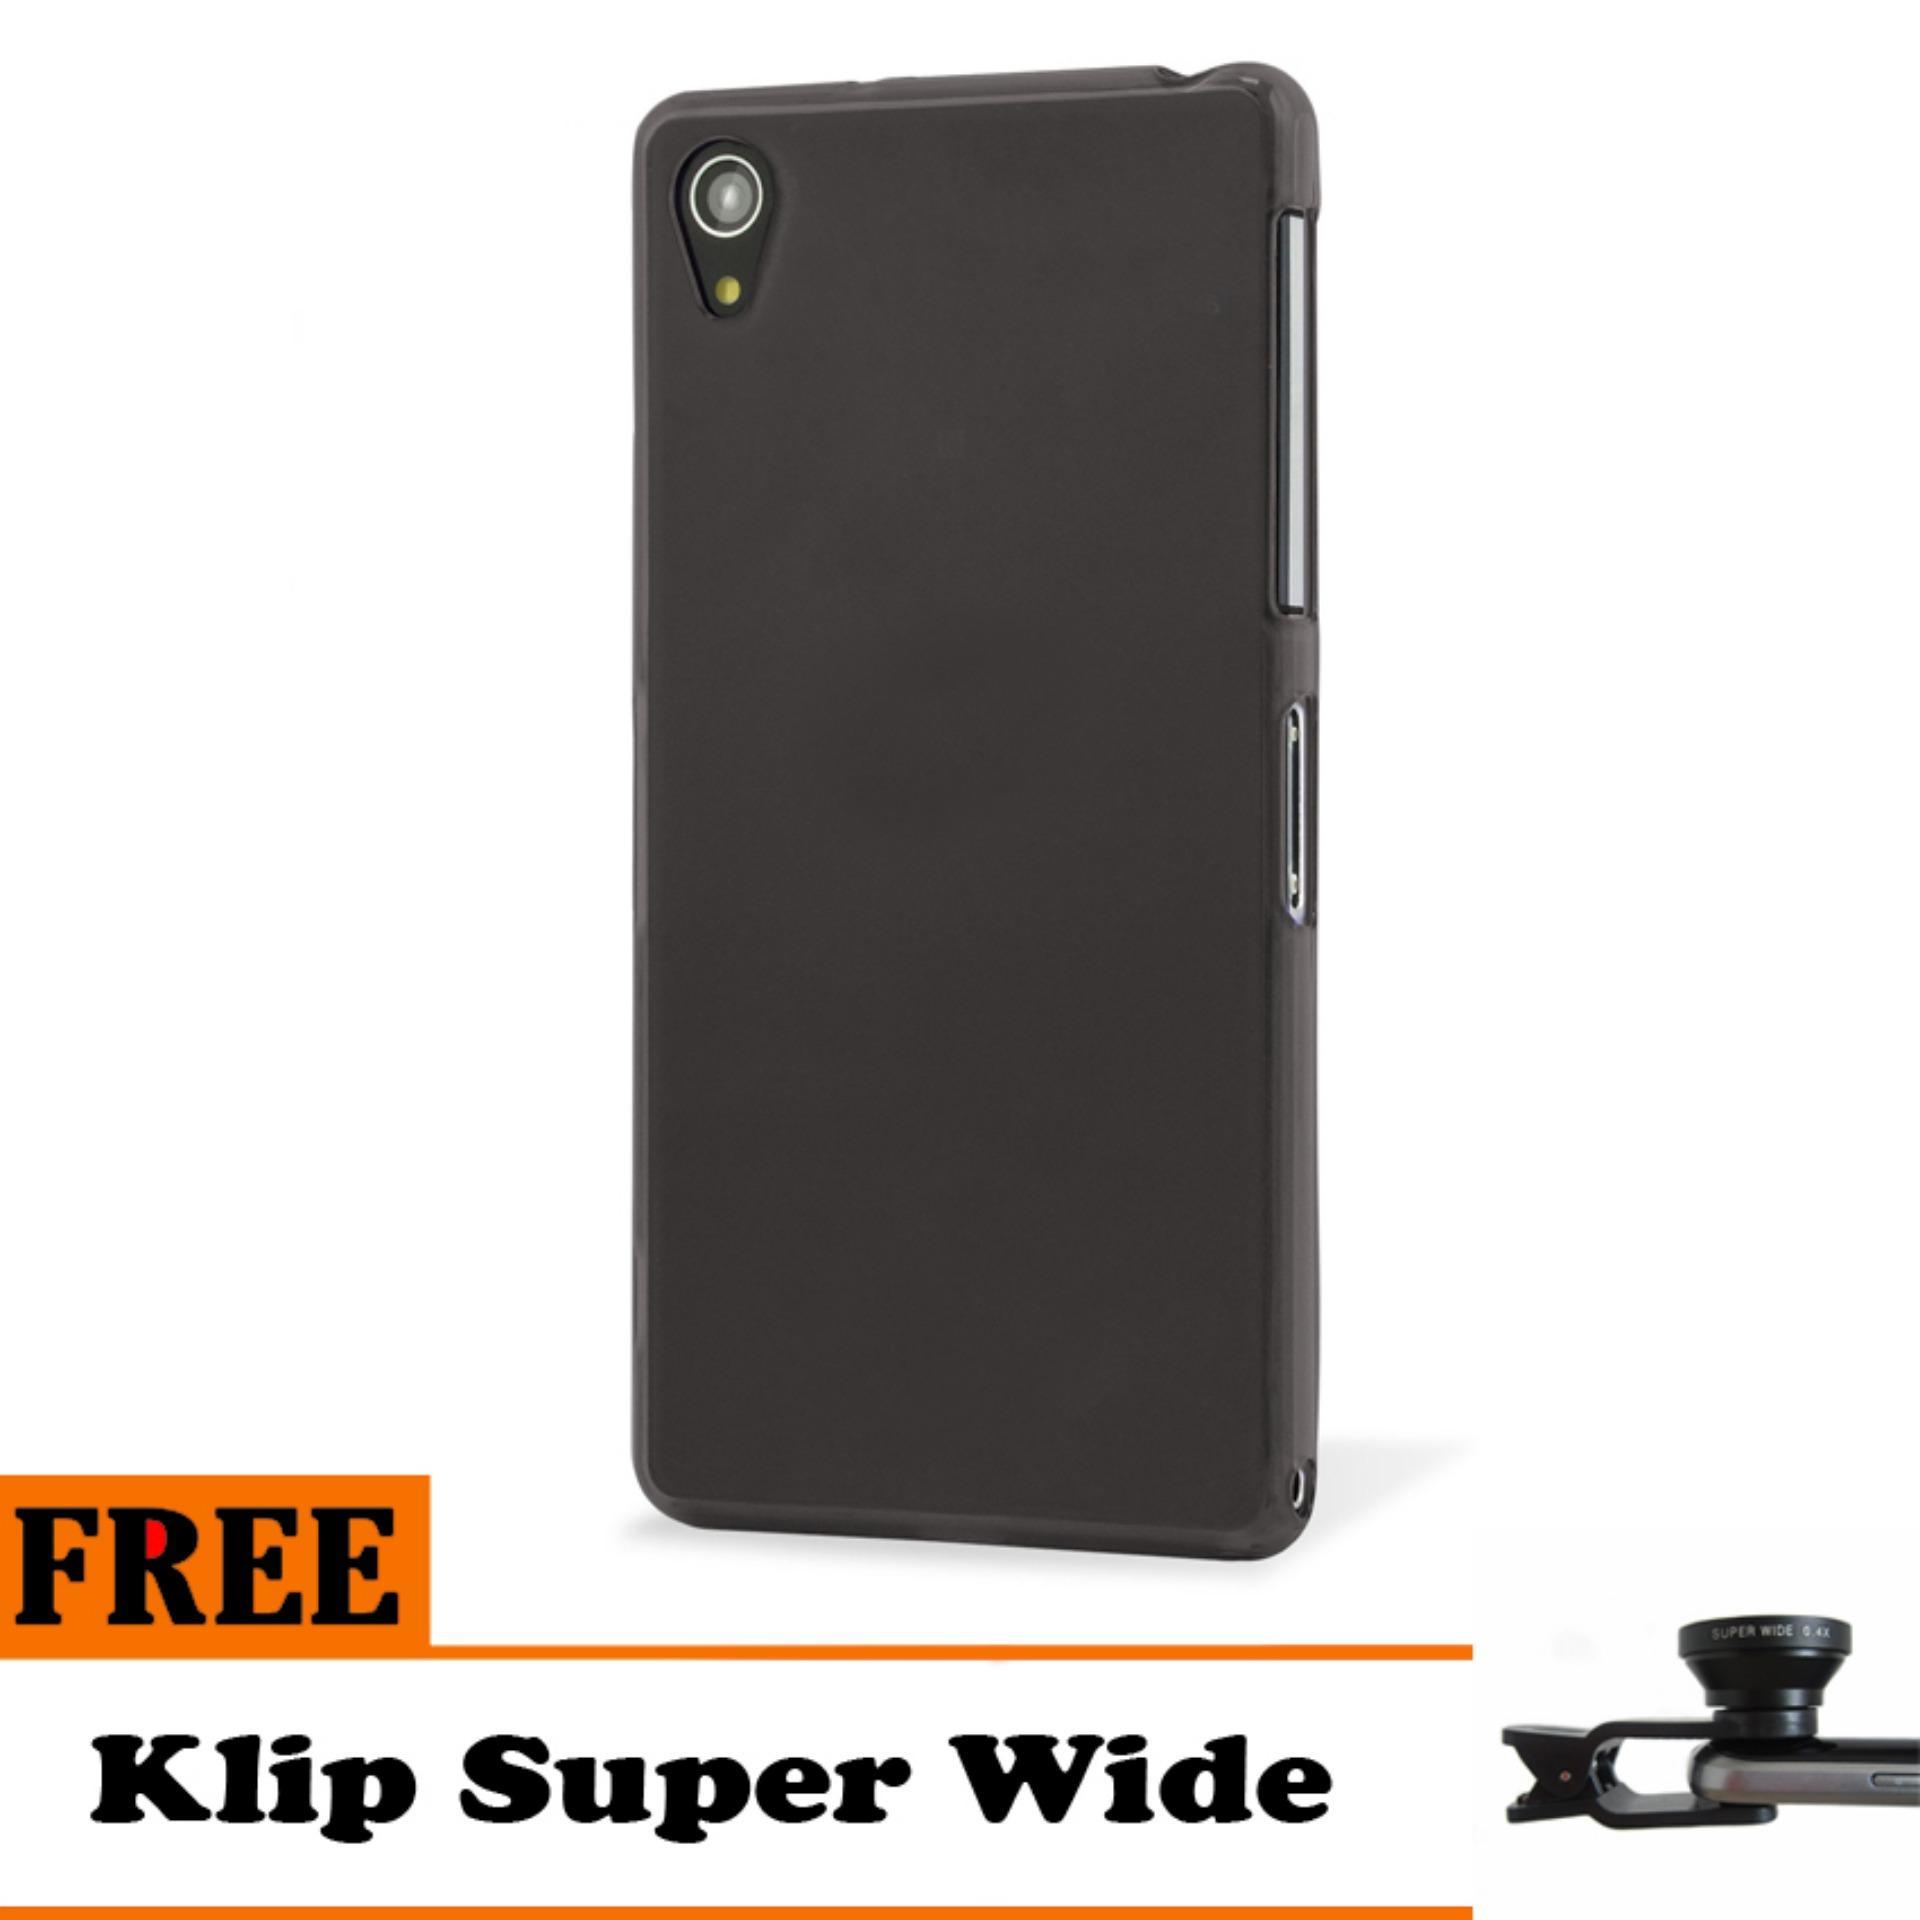 2 Super Frosted Shield Hard Case Original Hitam Gratis Anti Gores Clear. Source · Barokah Premium Slim Black Matte Shockproof Case for Sony Xperia Z1 - Free ...